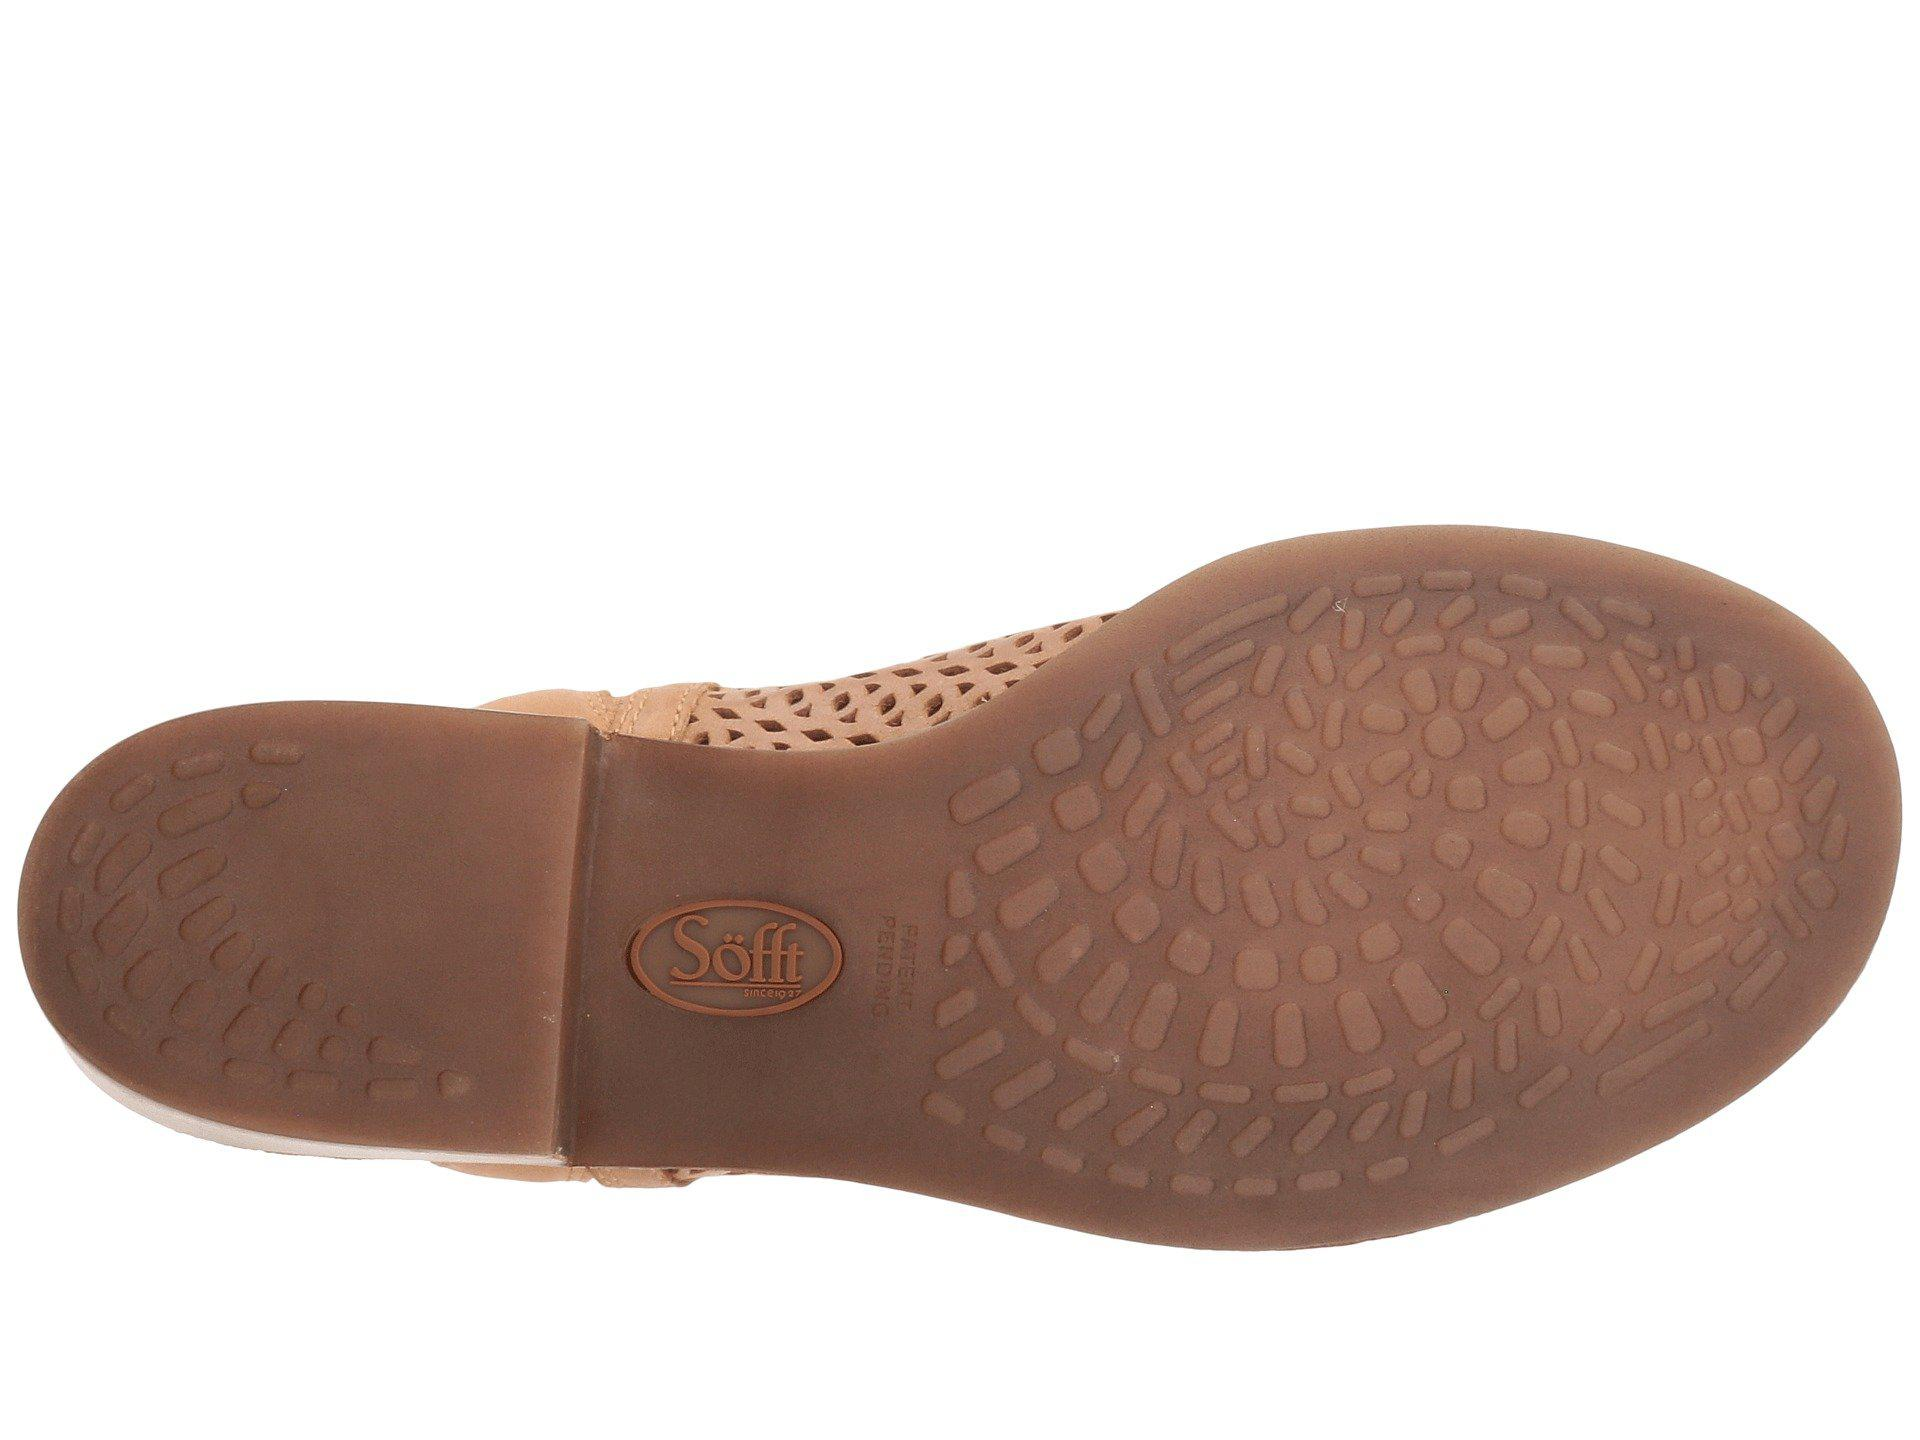 ca10b913b6ea ... Nalda (anthracite Distressed Foil Suede) Women s 1-2 Inch Heel. View  fullscreen